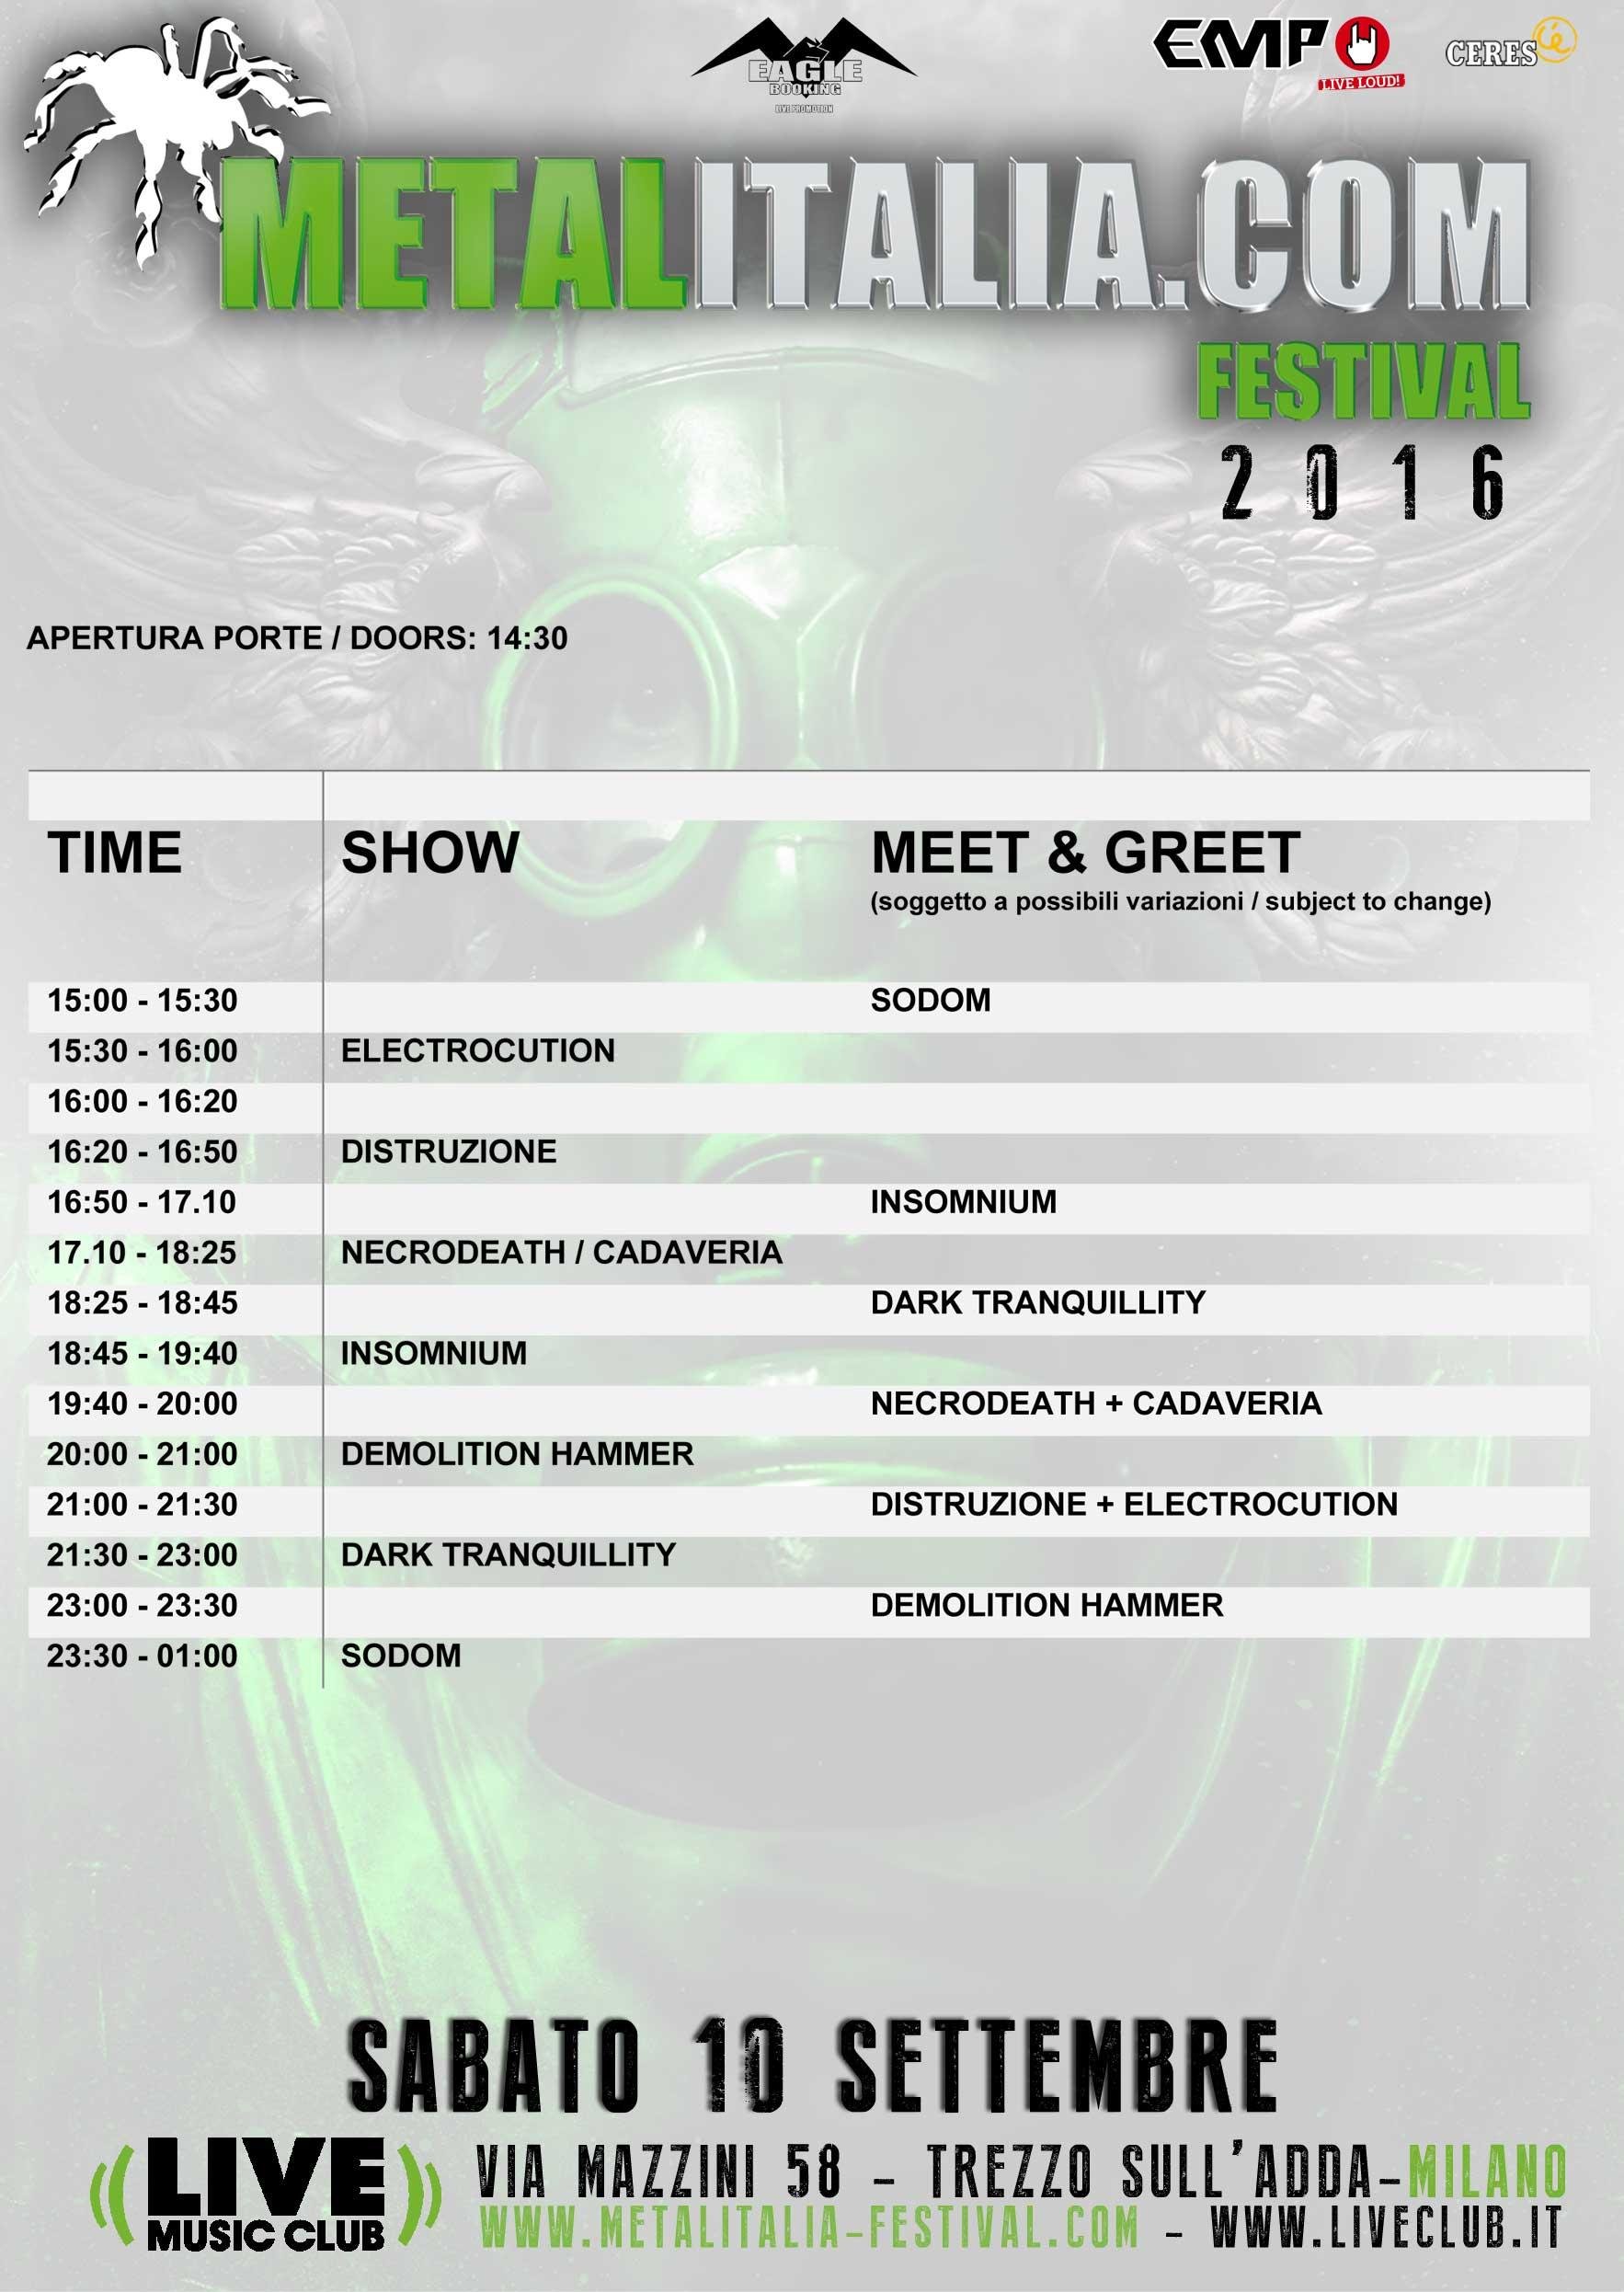 metalitalia festival 2016 - orari